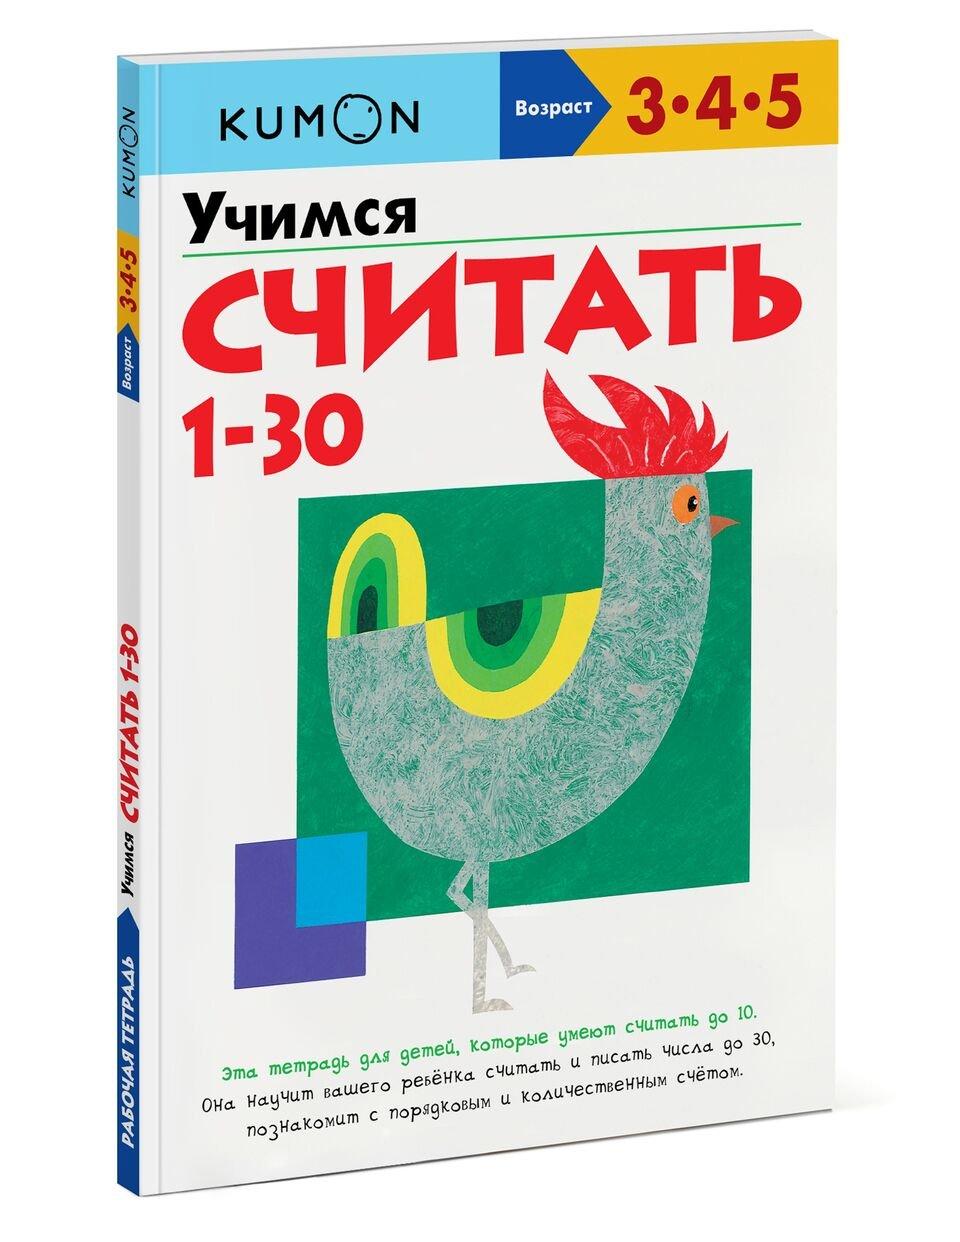 KUMON Учимся считать от 1 до 30 KUMON kumon игры с числами от 1 до 150 kumon